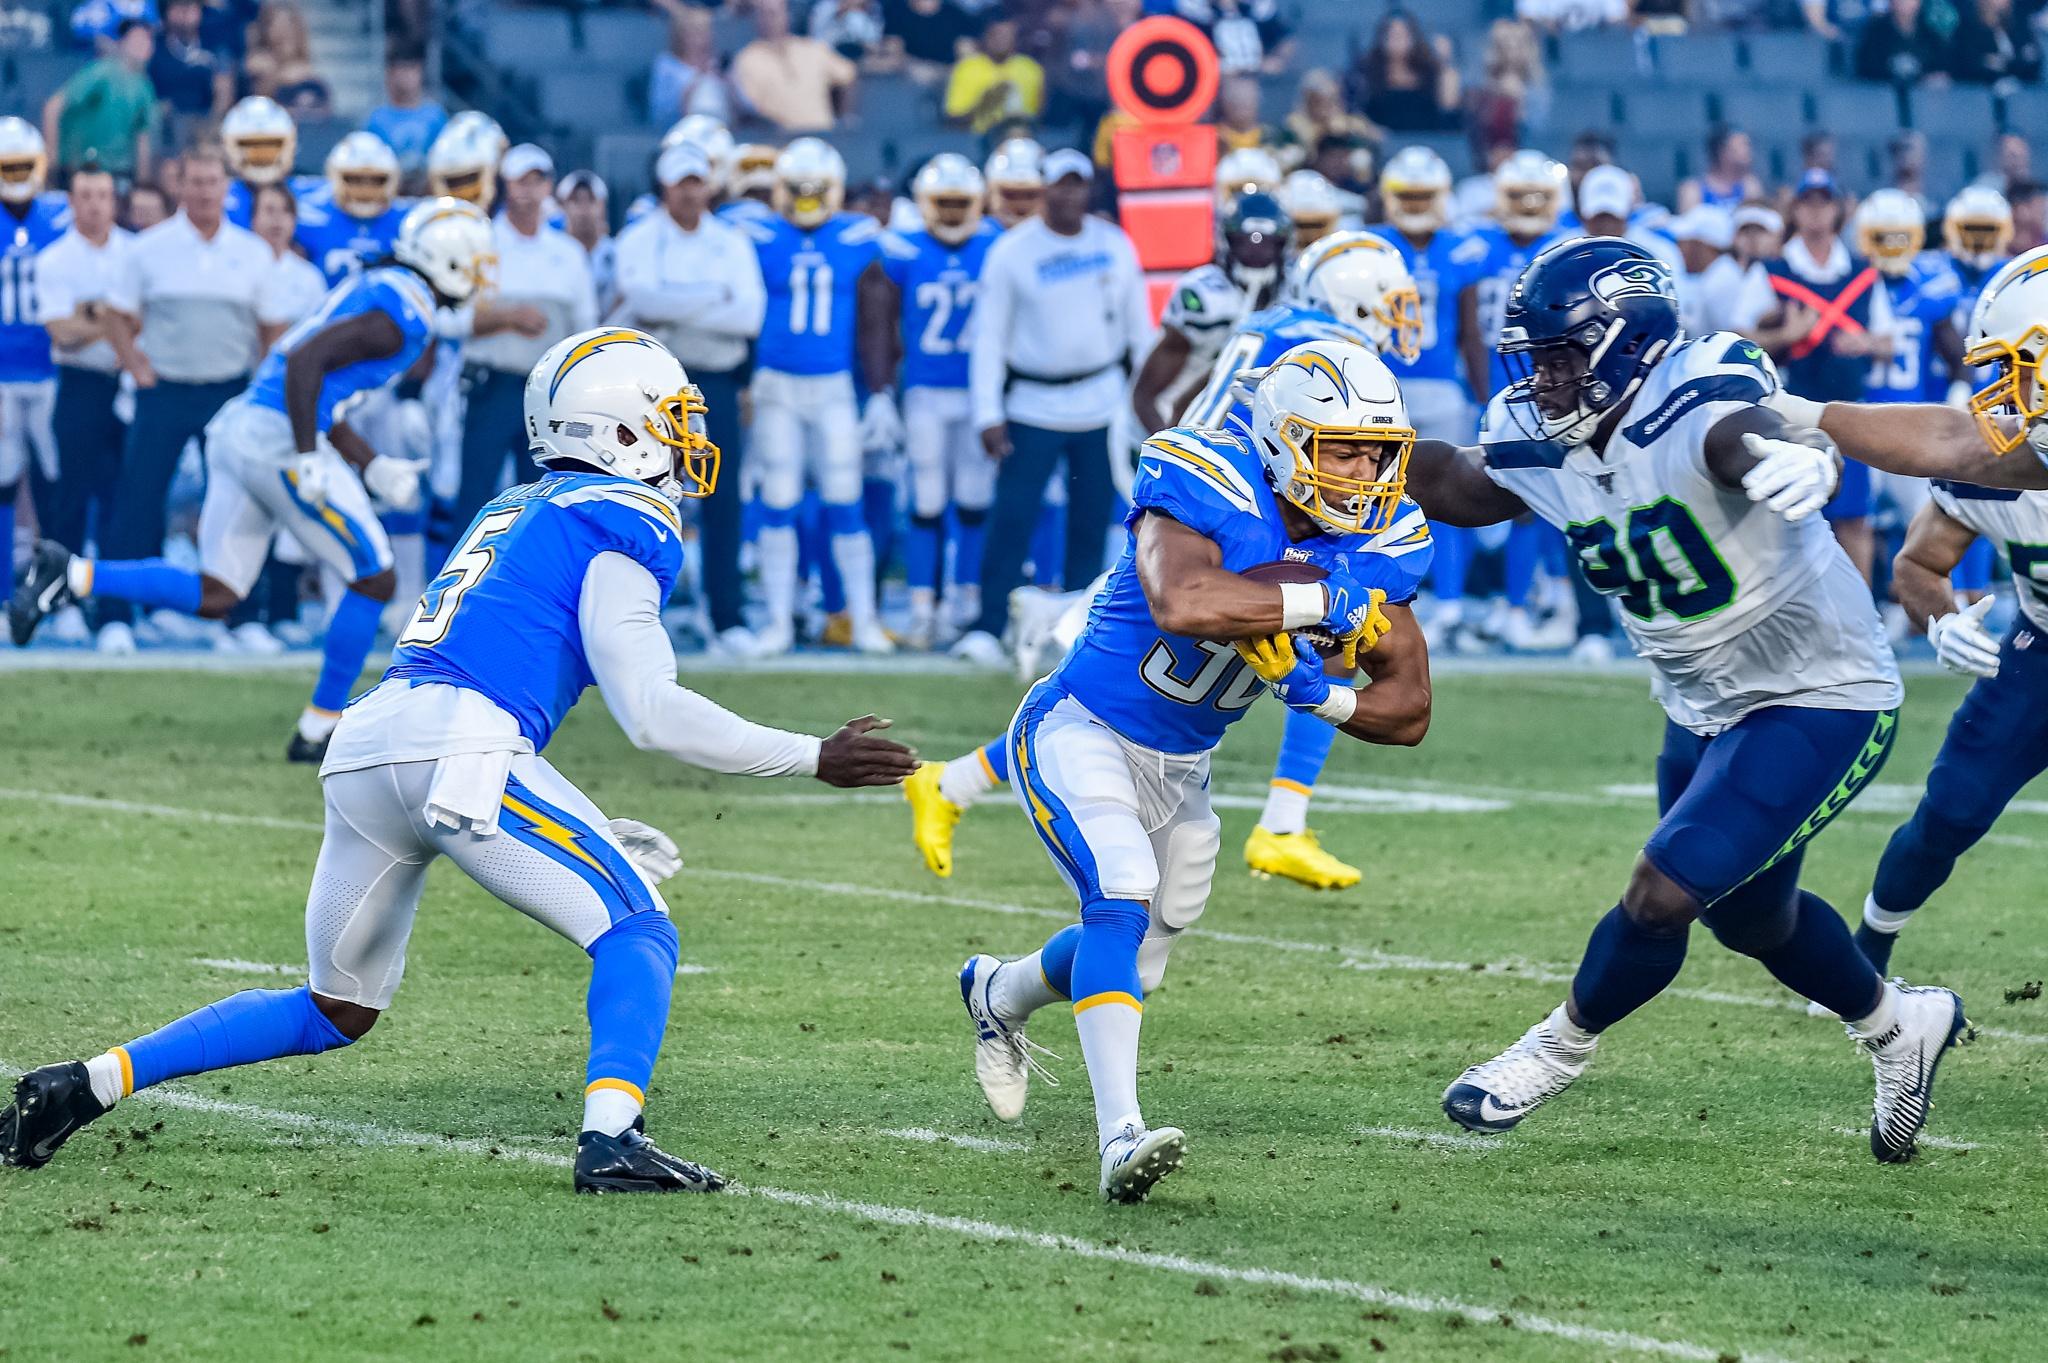 © Mark Hammond/News4usonline - Aug. 24, 2019 - Seahawks vs. Chargers - Chargers quarterback Tyrod Taylor (5) hands off to running back Austin Ekeler.